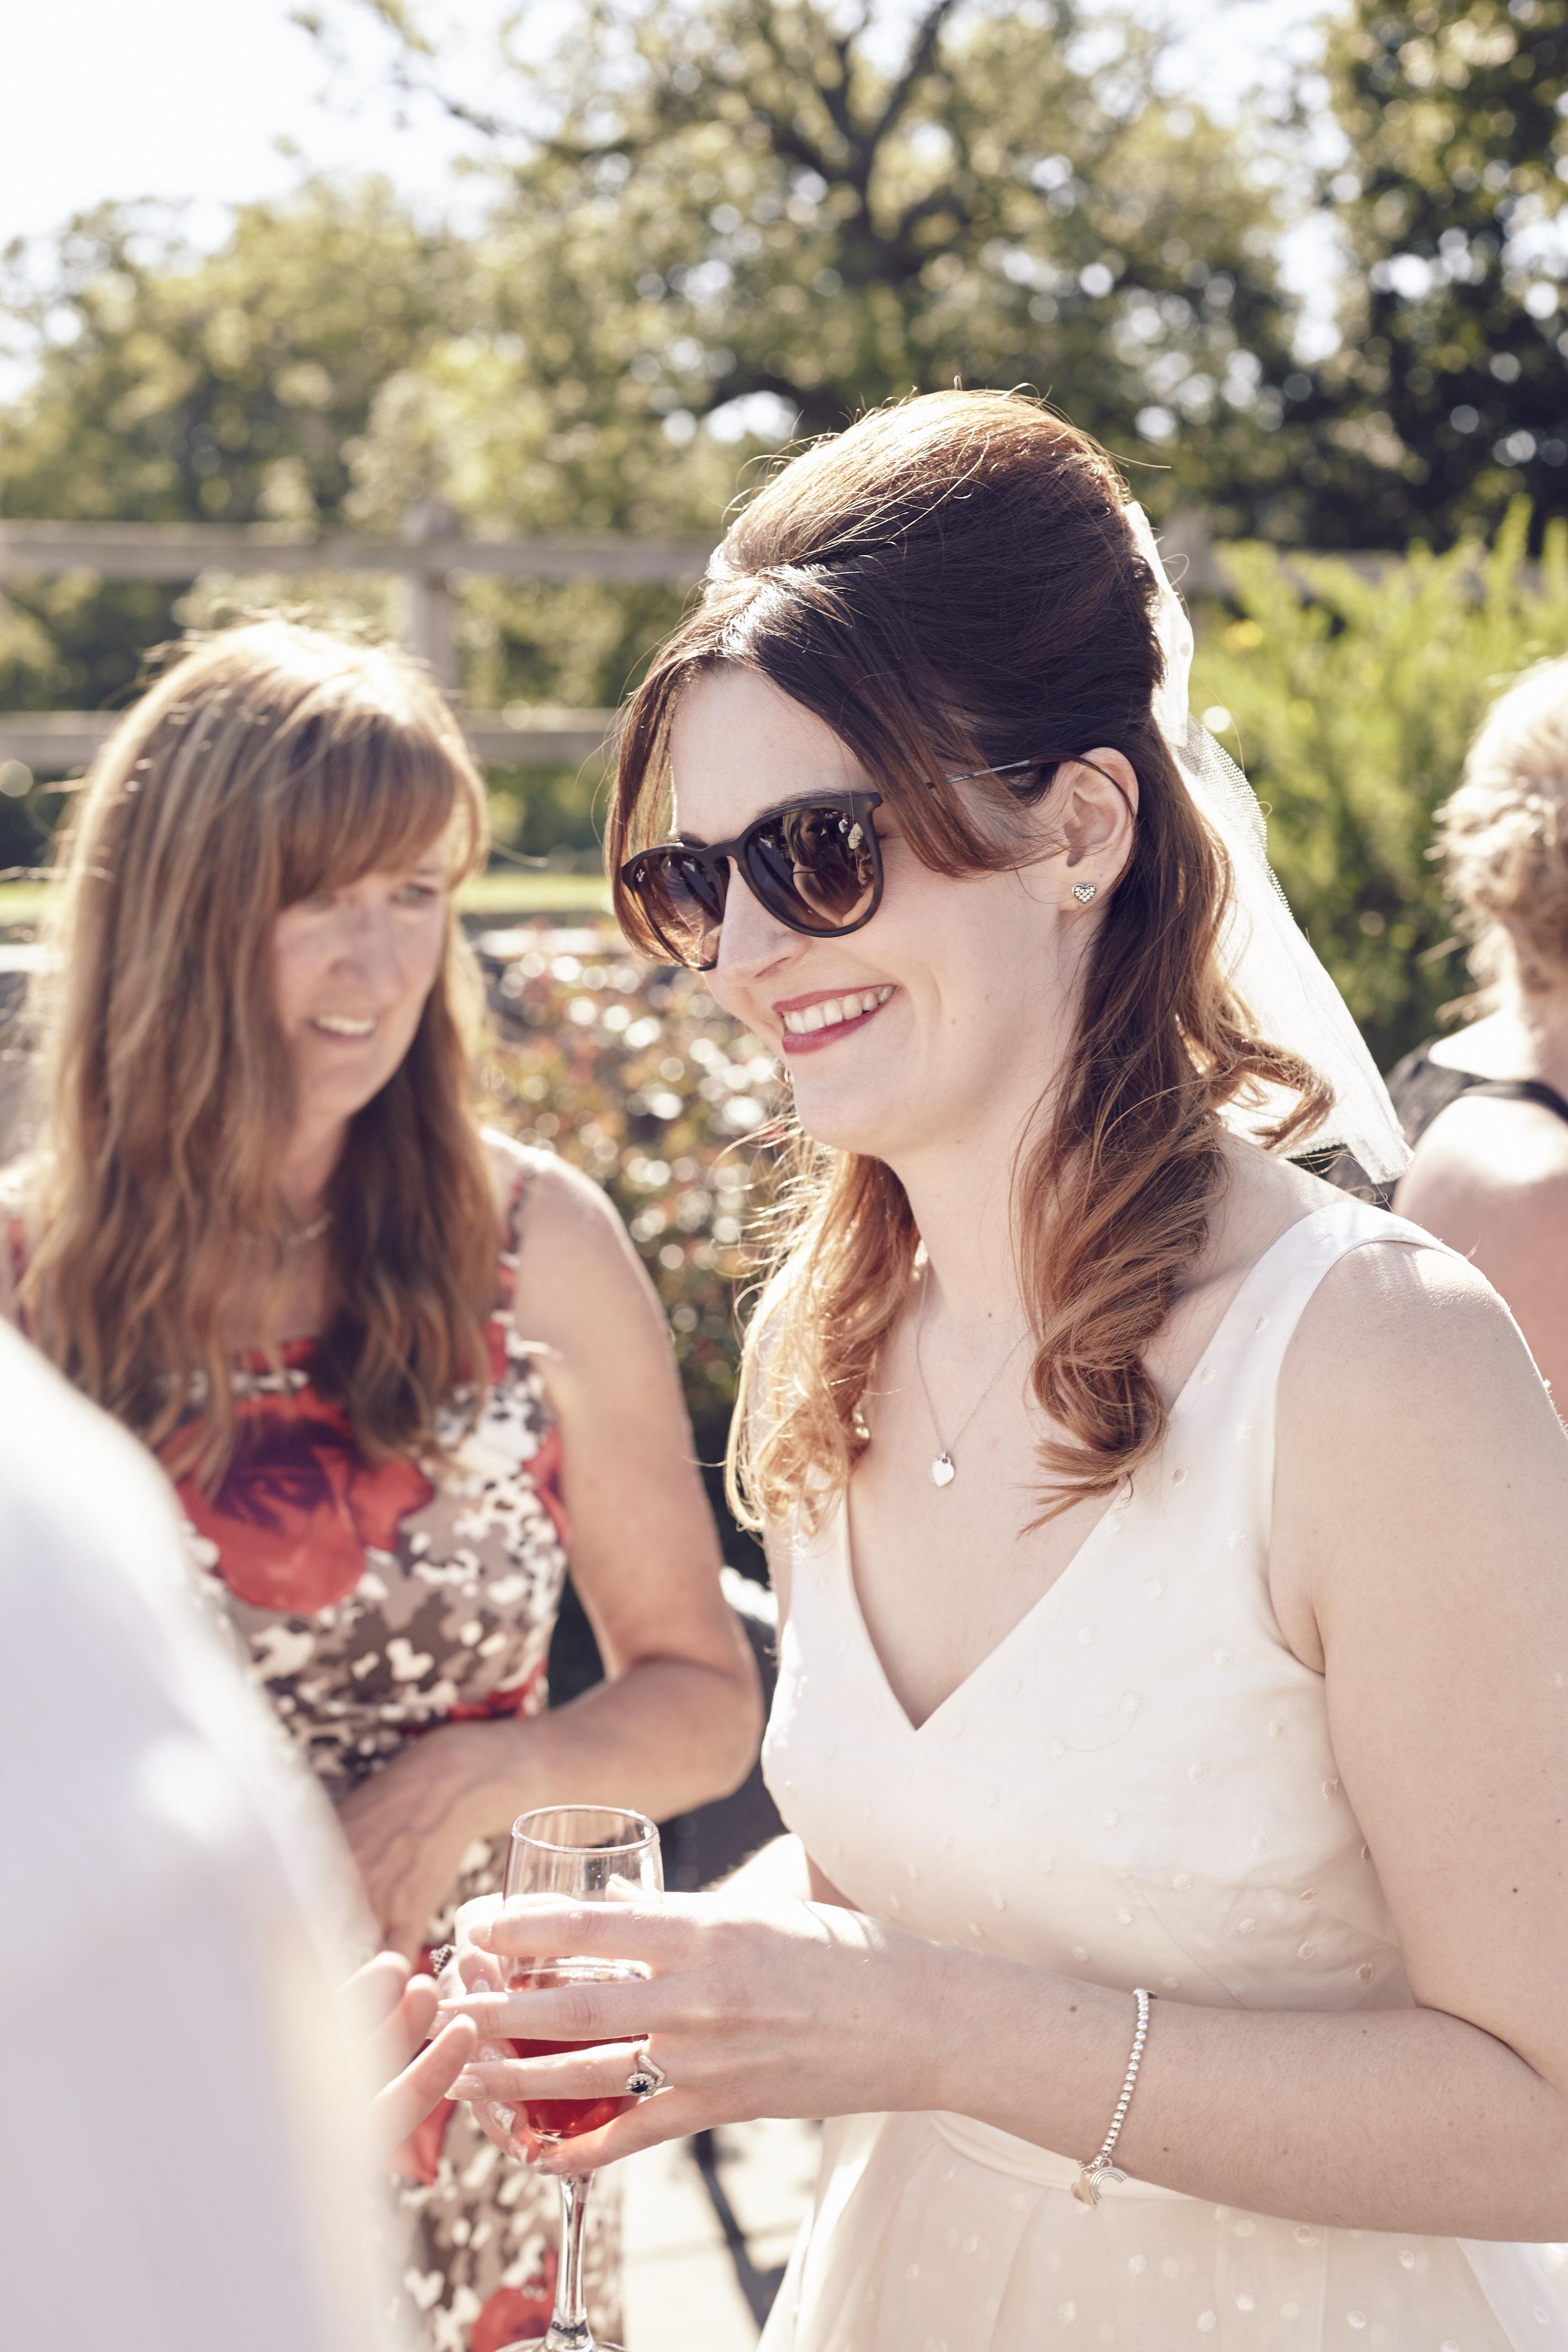 Suzi-Matlock-Polka-Dot-Bespoke-Wedding-Dress-High-Low-Susanna-Greening-Designs-Derbyshire-16